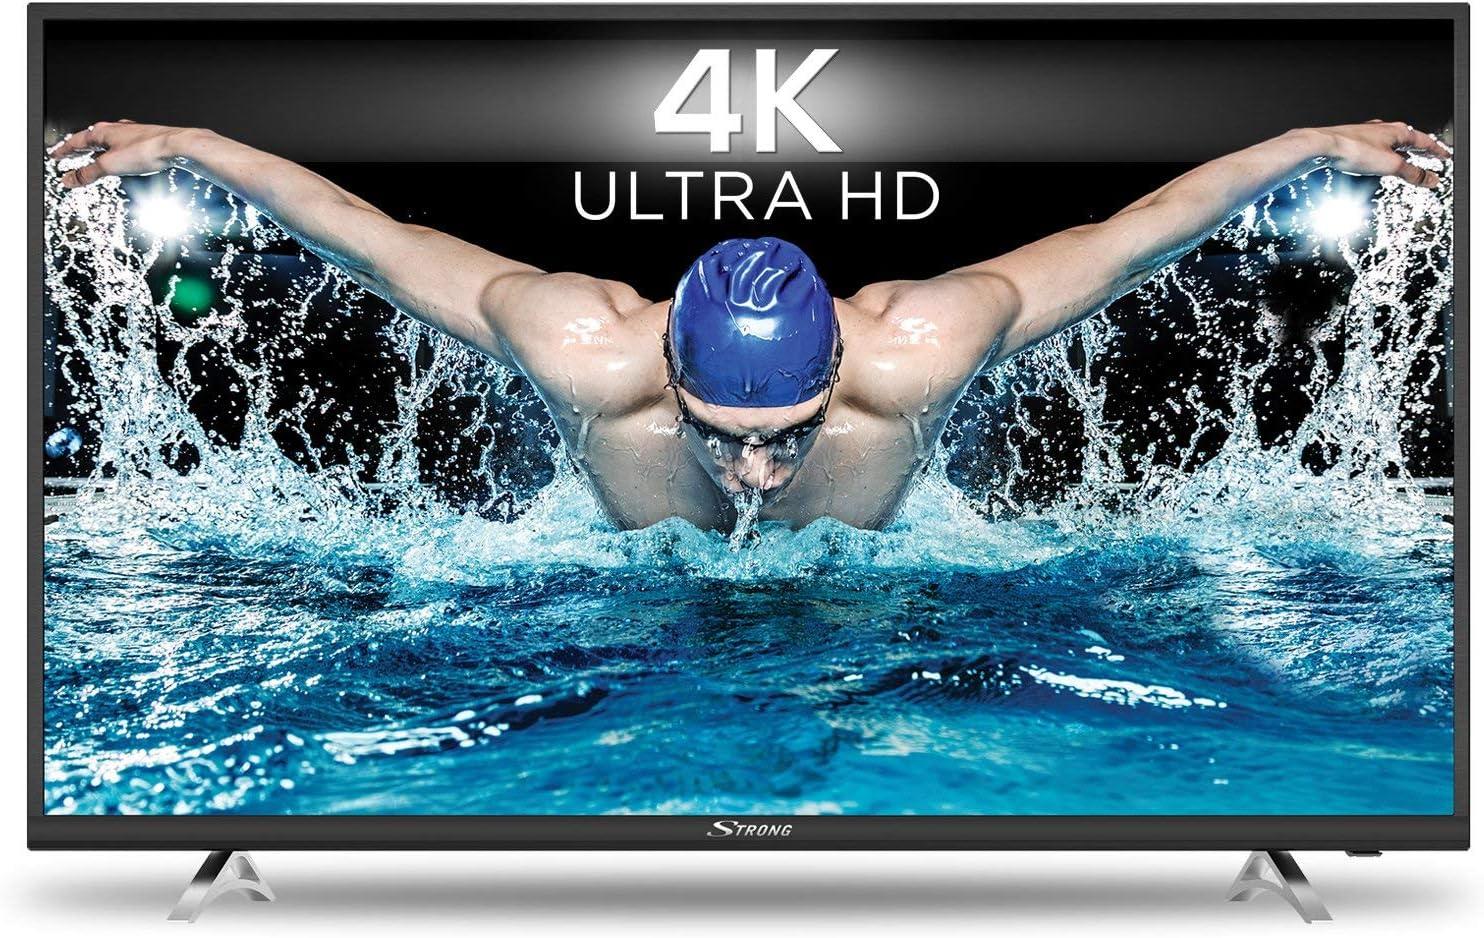 STRONG SRT 49UA6203 UHD Smart TV HDR – 4K Televisores LED 49 Pulgadas, 123 cm (Netflix, Youtube) negro: Amazon.es: Electrónica